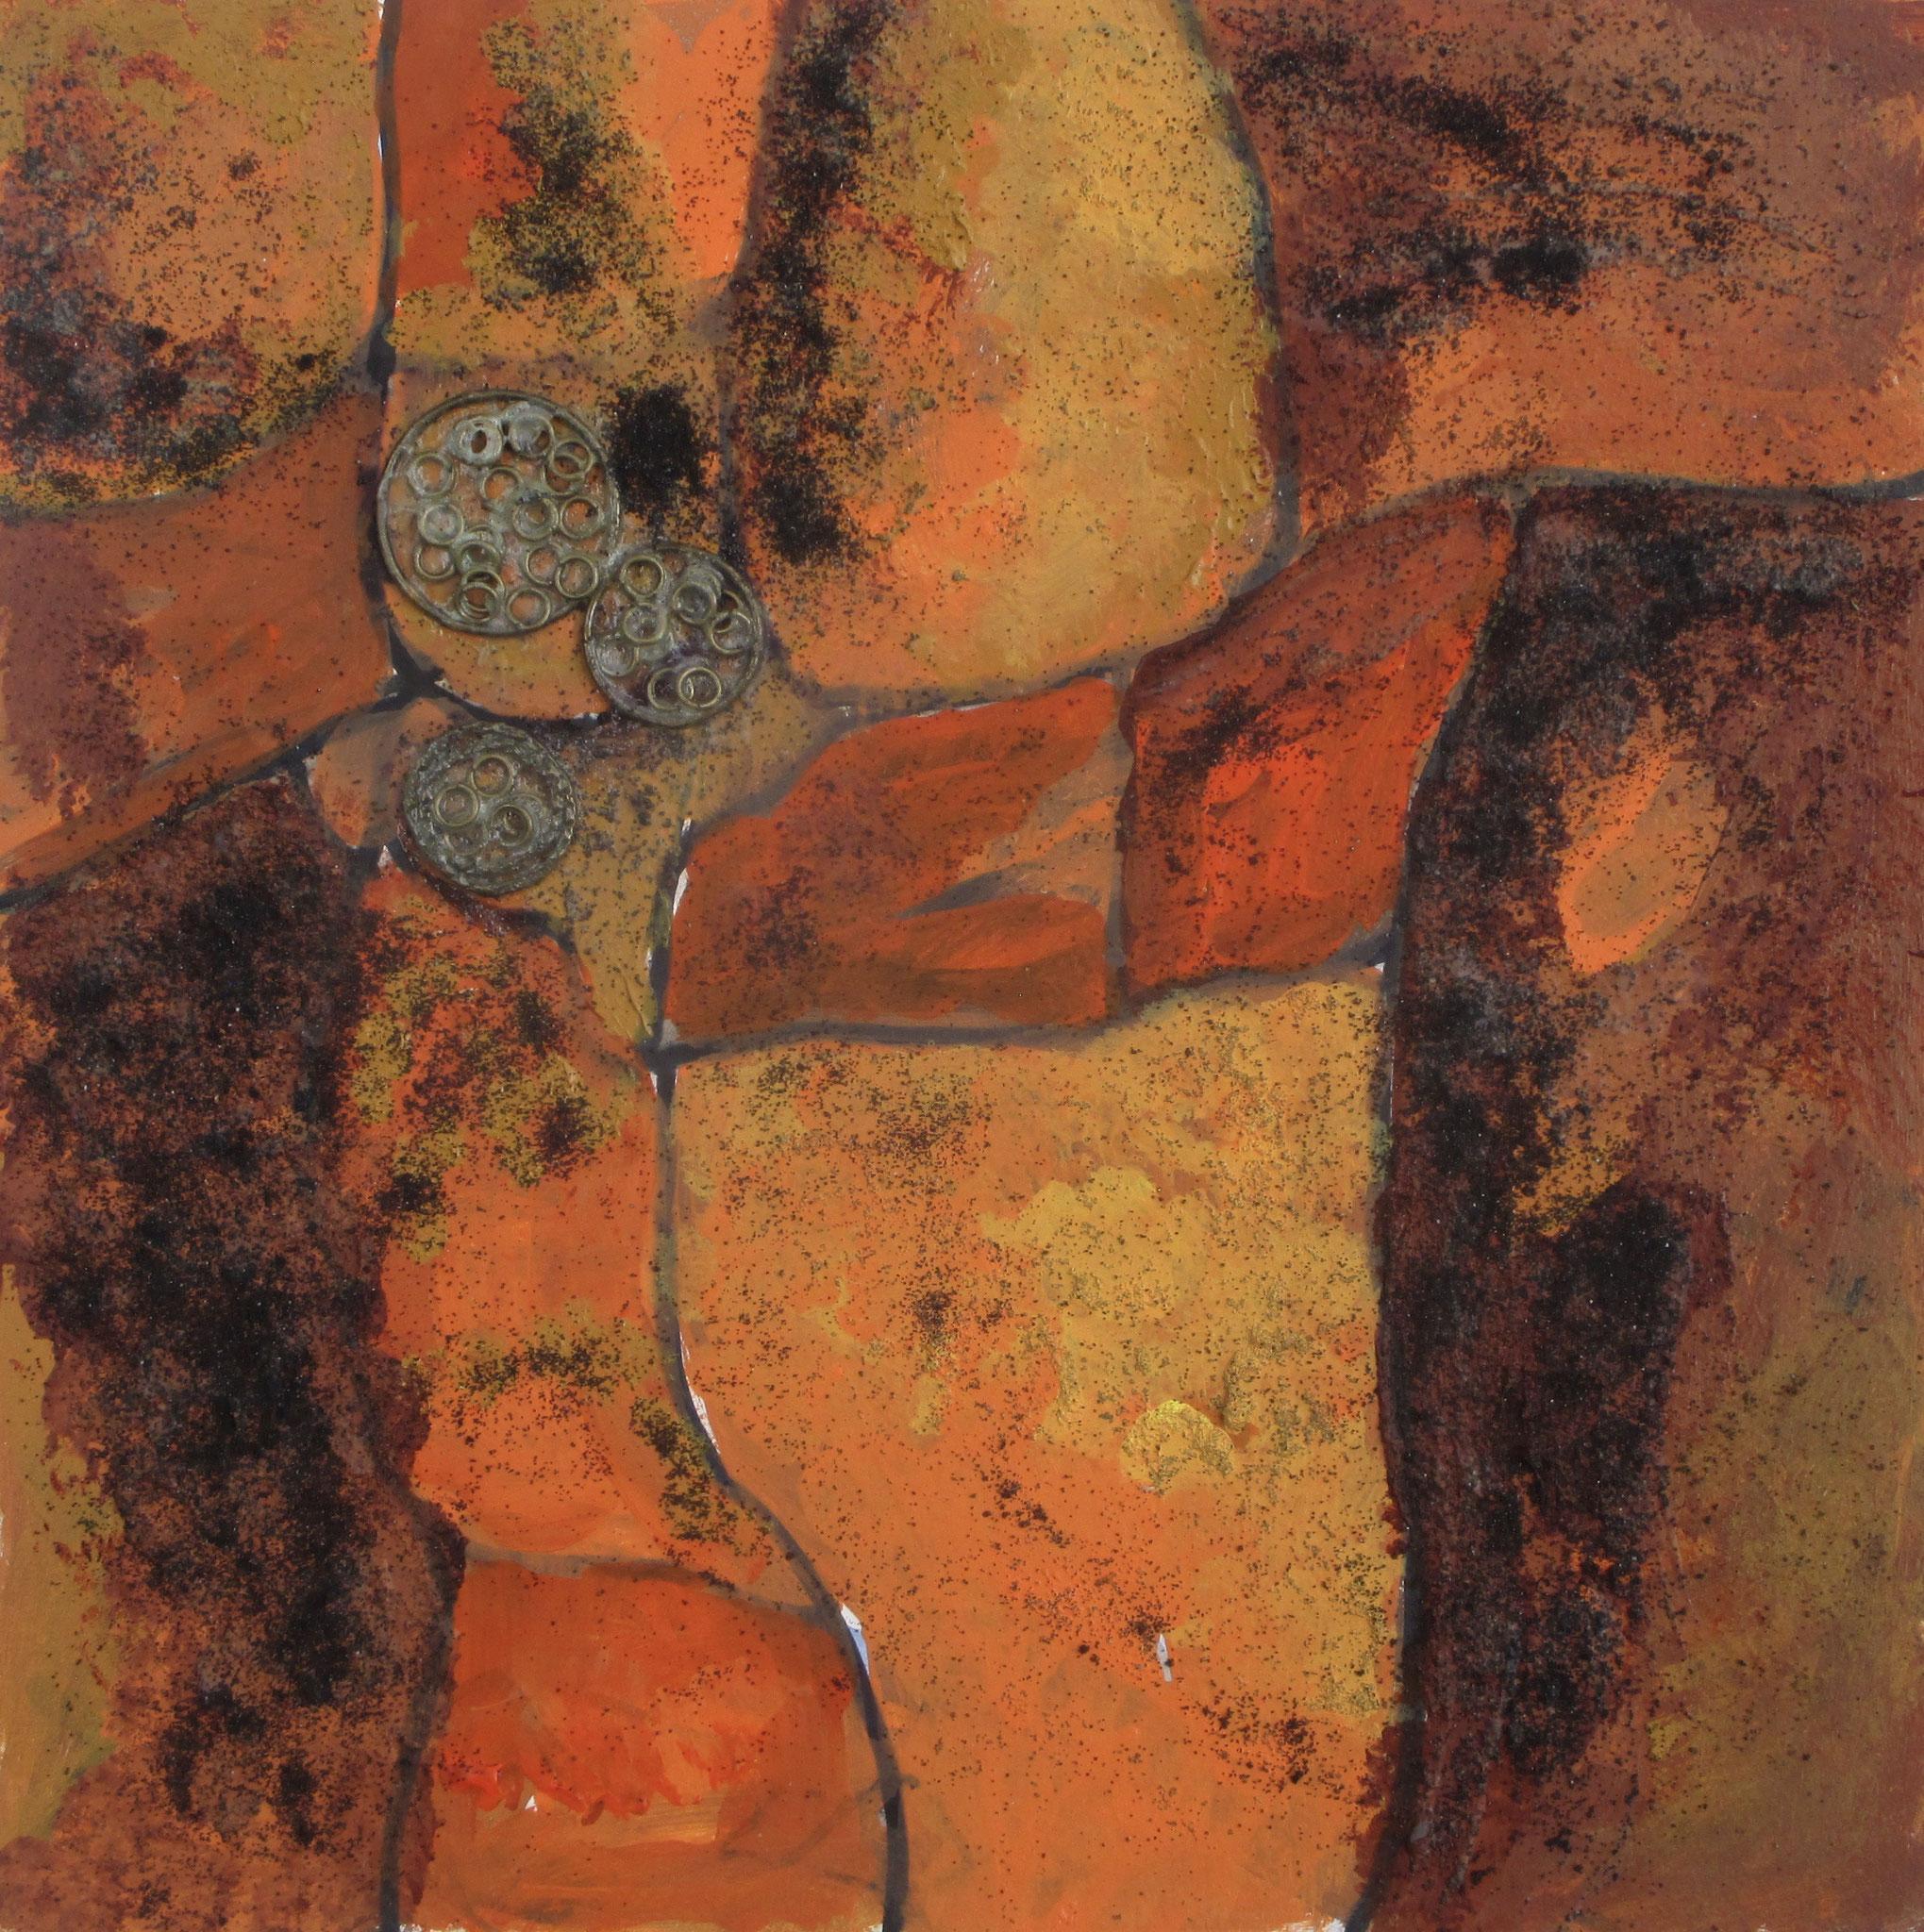 Circle of Life, acrylic, clay on board, 12 x 12